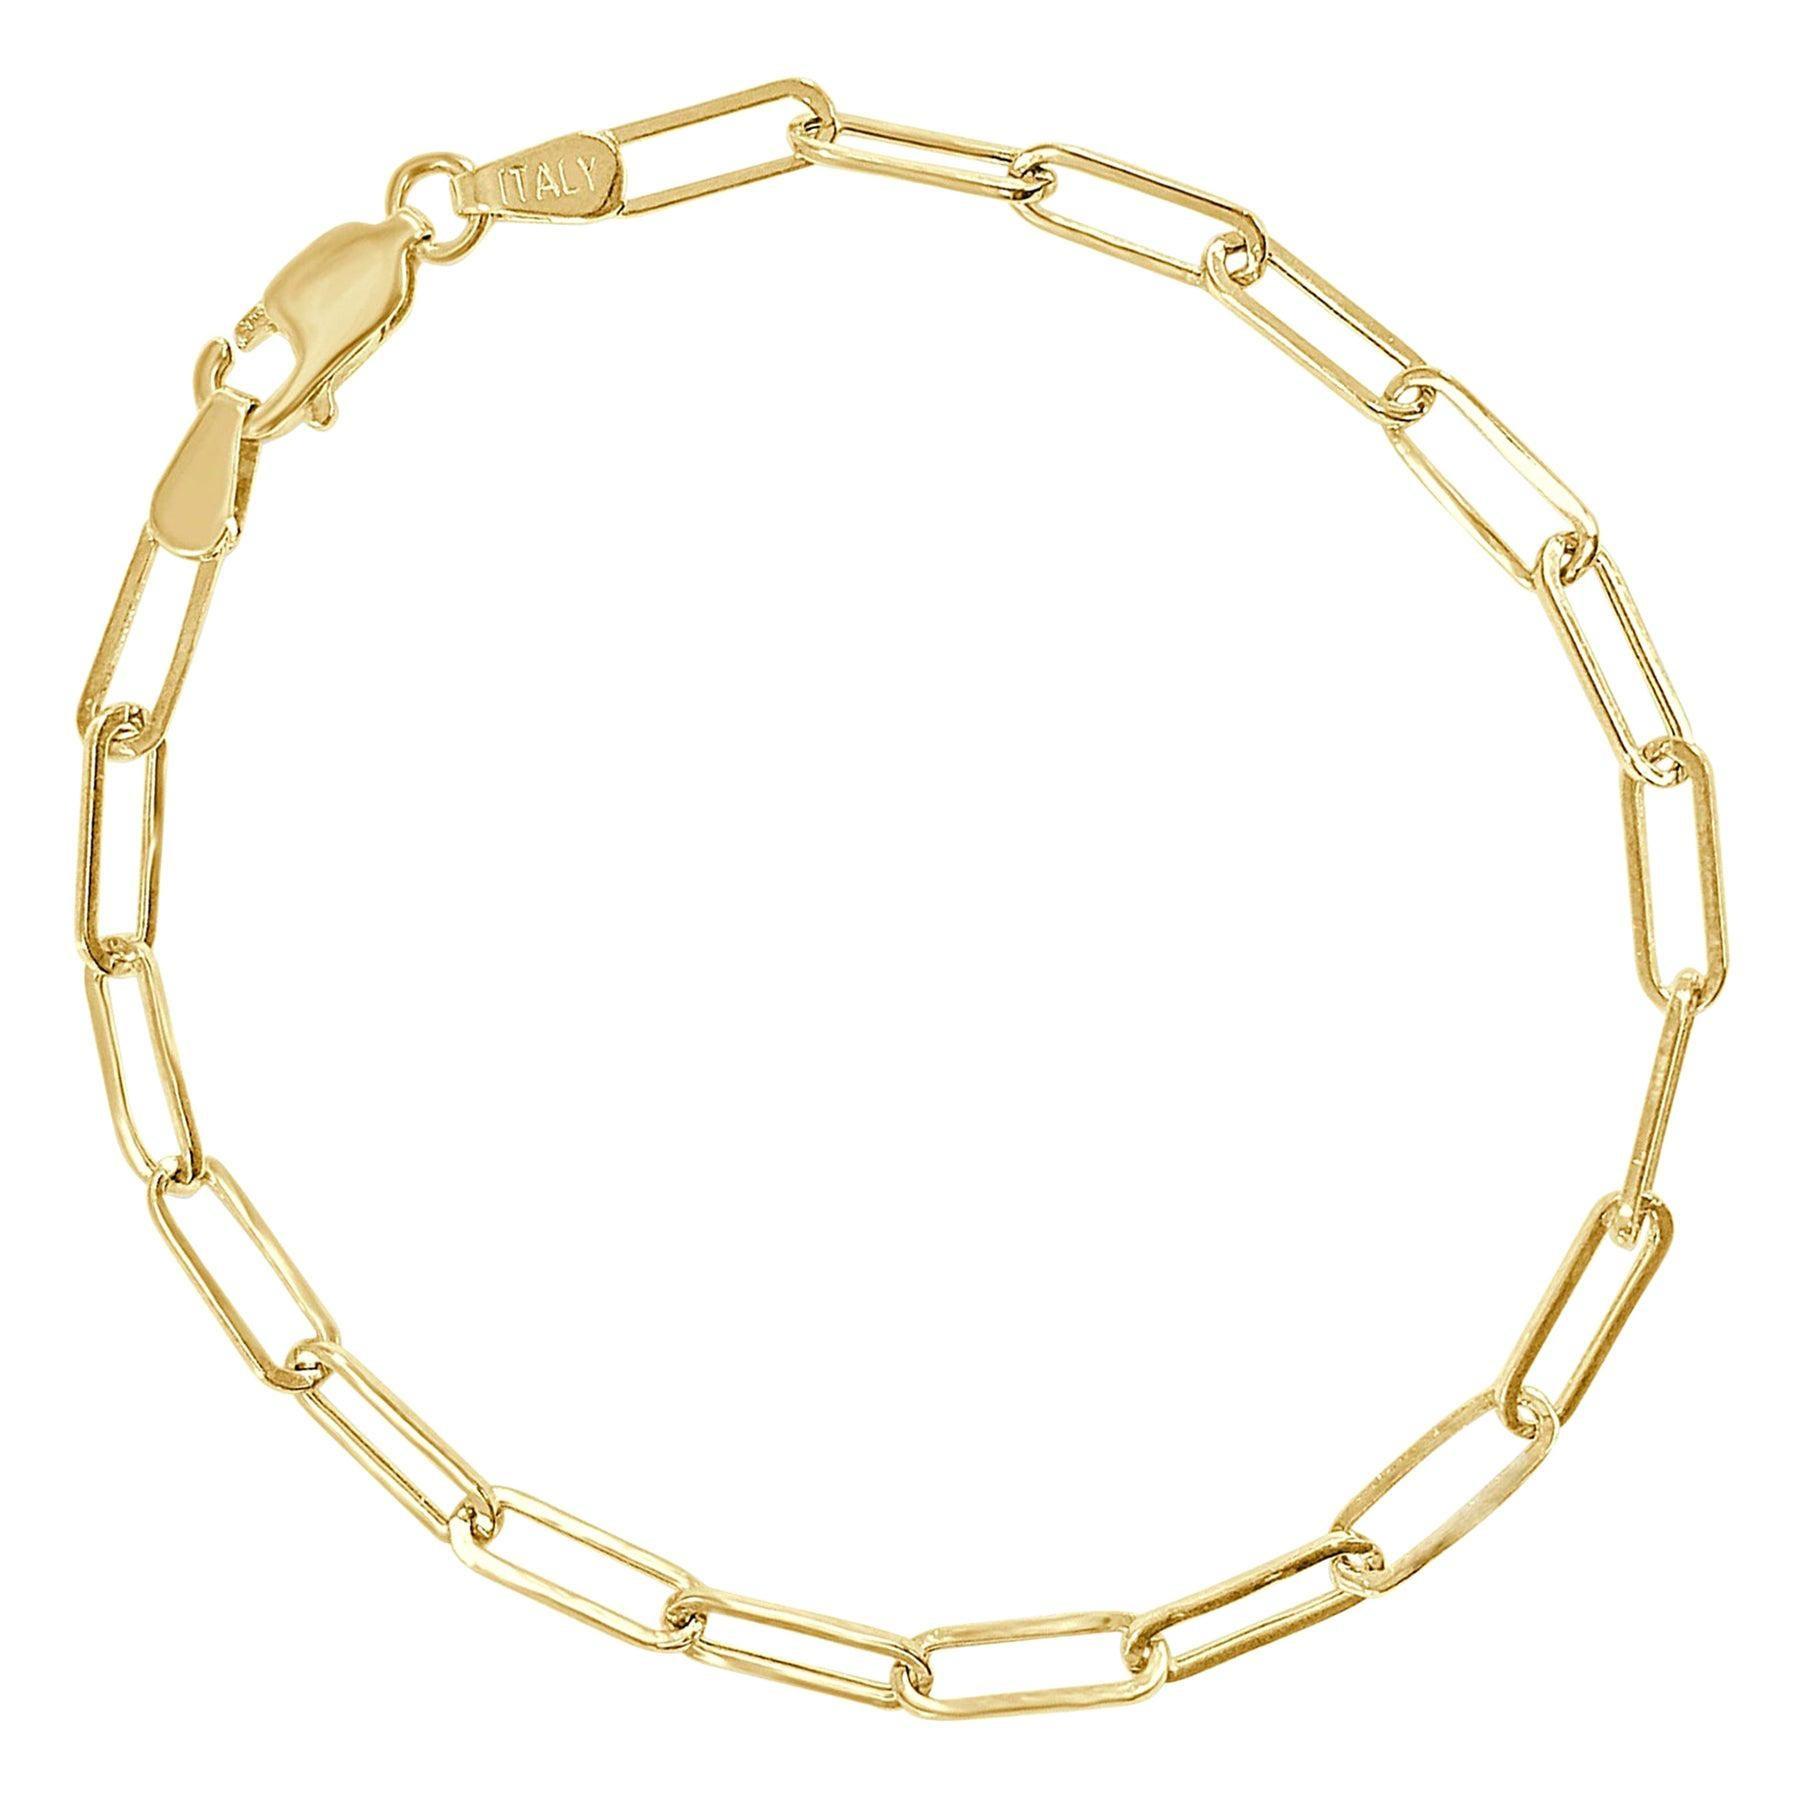 14 Karat Yellow Gold Link Paperclip Chain Bracelet 1.7 g